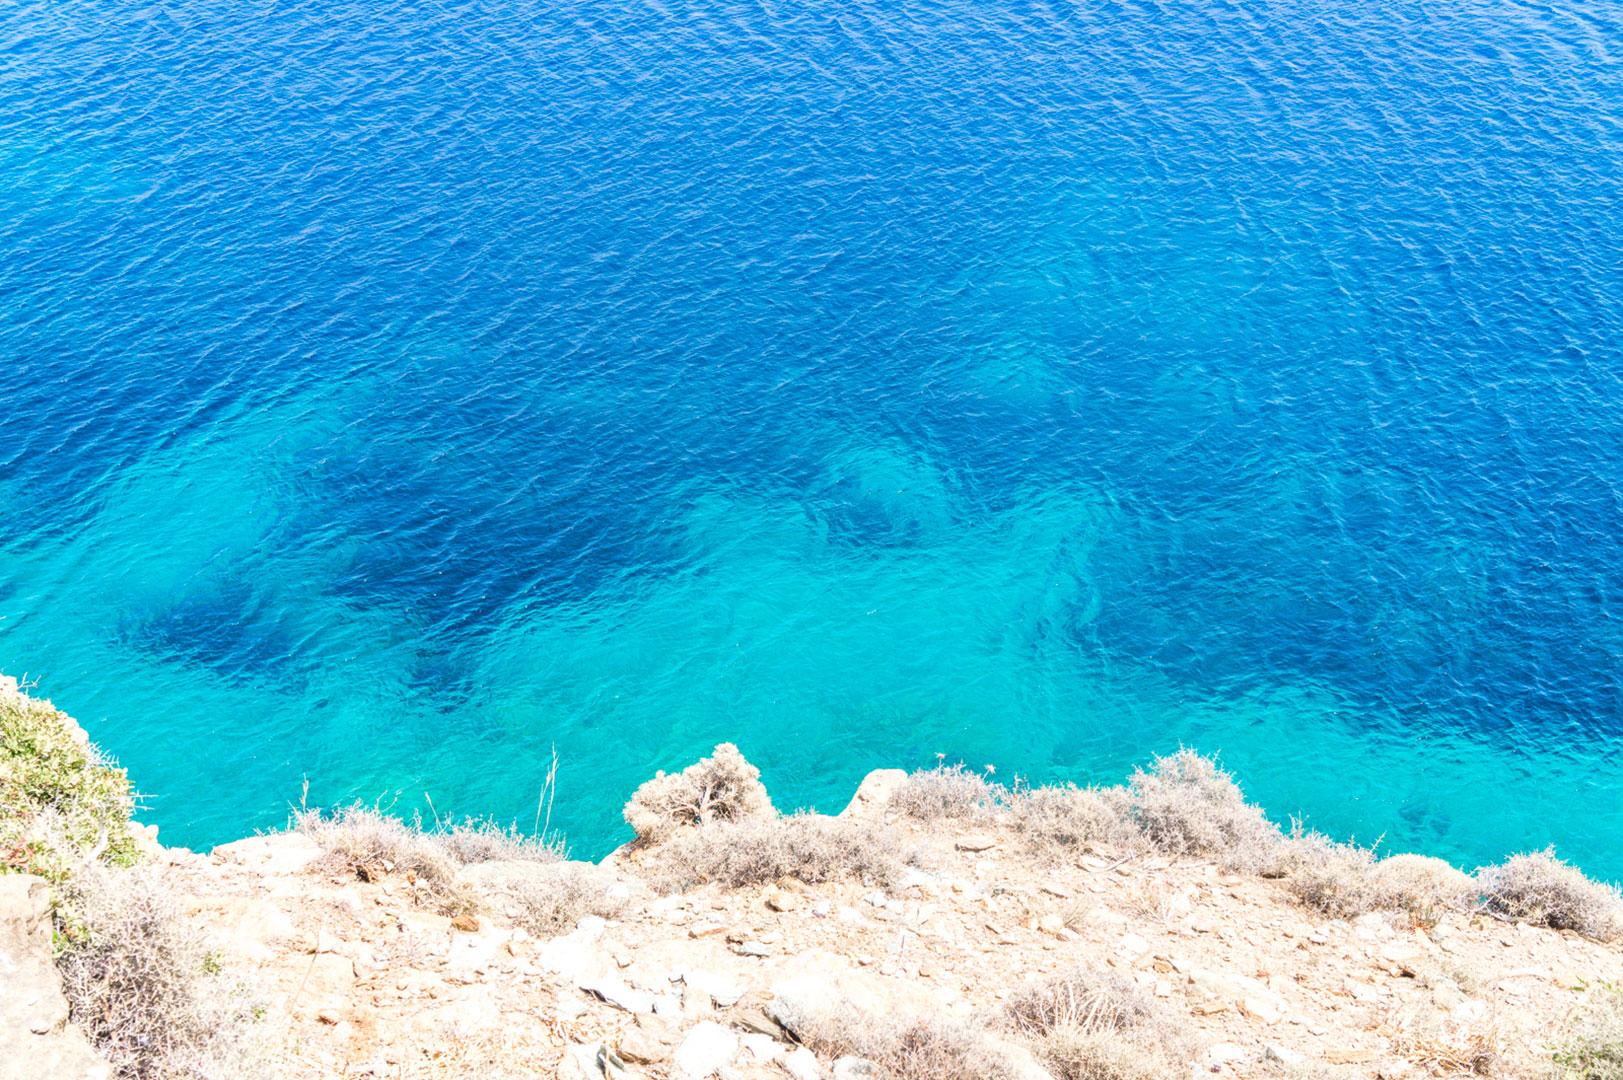 sifnos-greece-la-vie-en-blog-all-rights-reserved-30